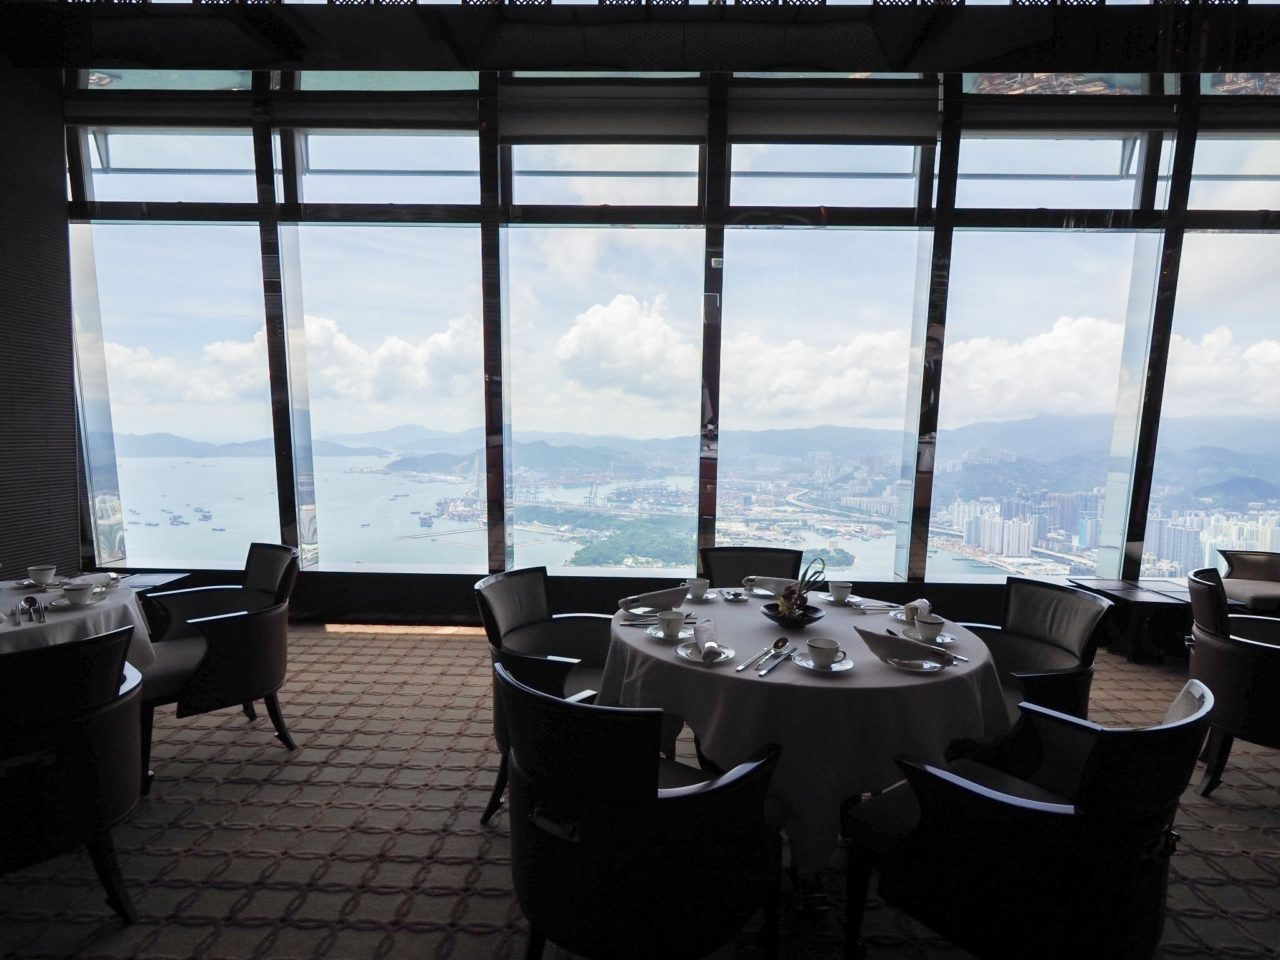 img 0589 - TIN LUNG HEEN- ザ・リッツ・カールトン香港 102階でいただく天龍軒の絶品飲茶